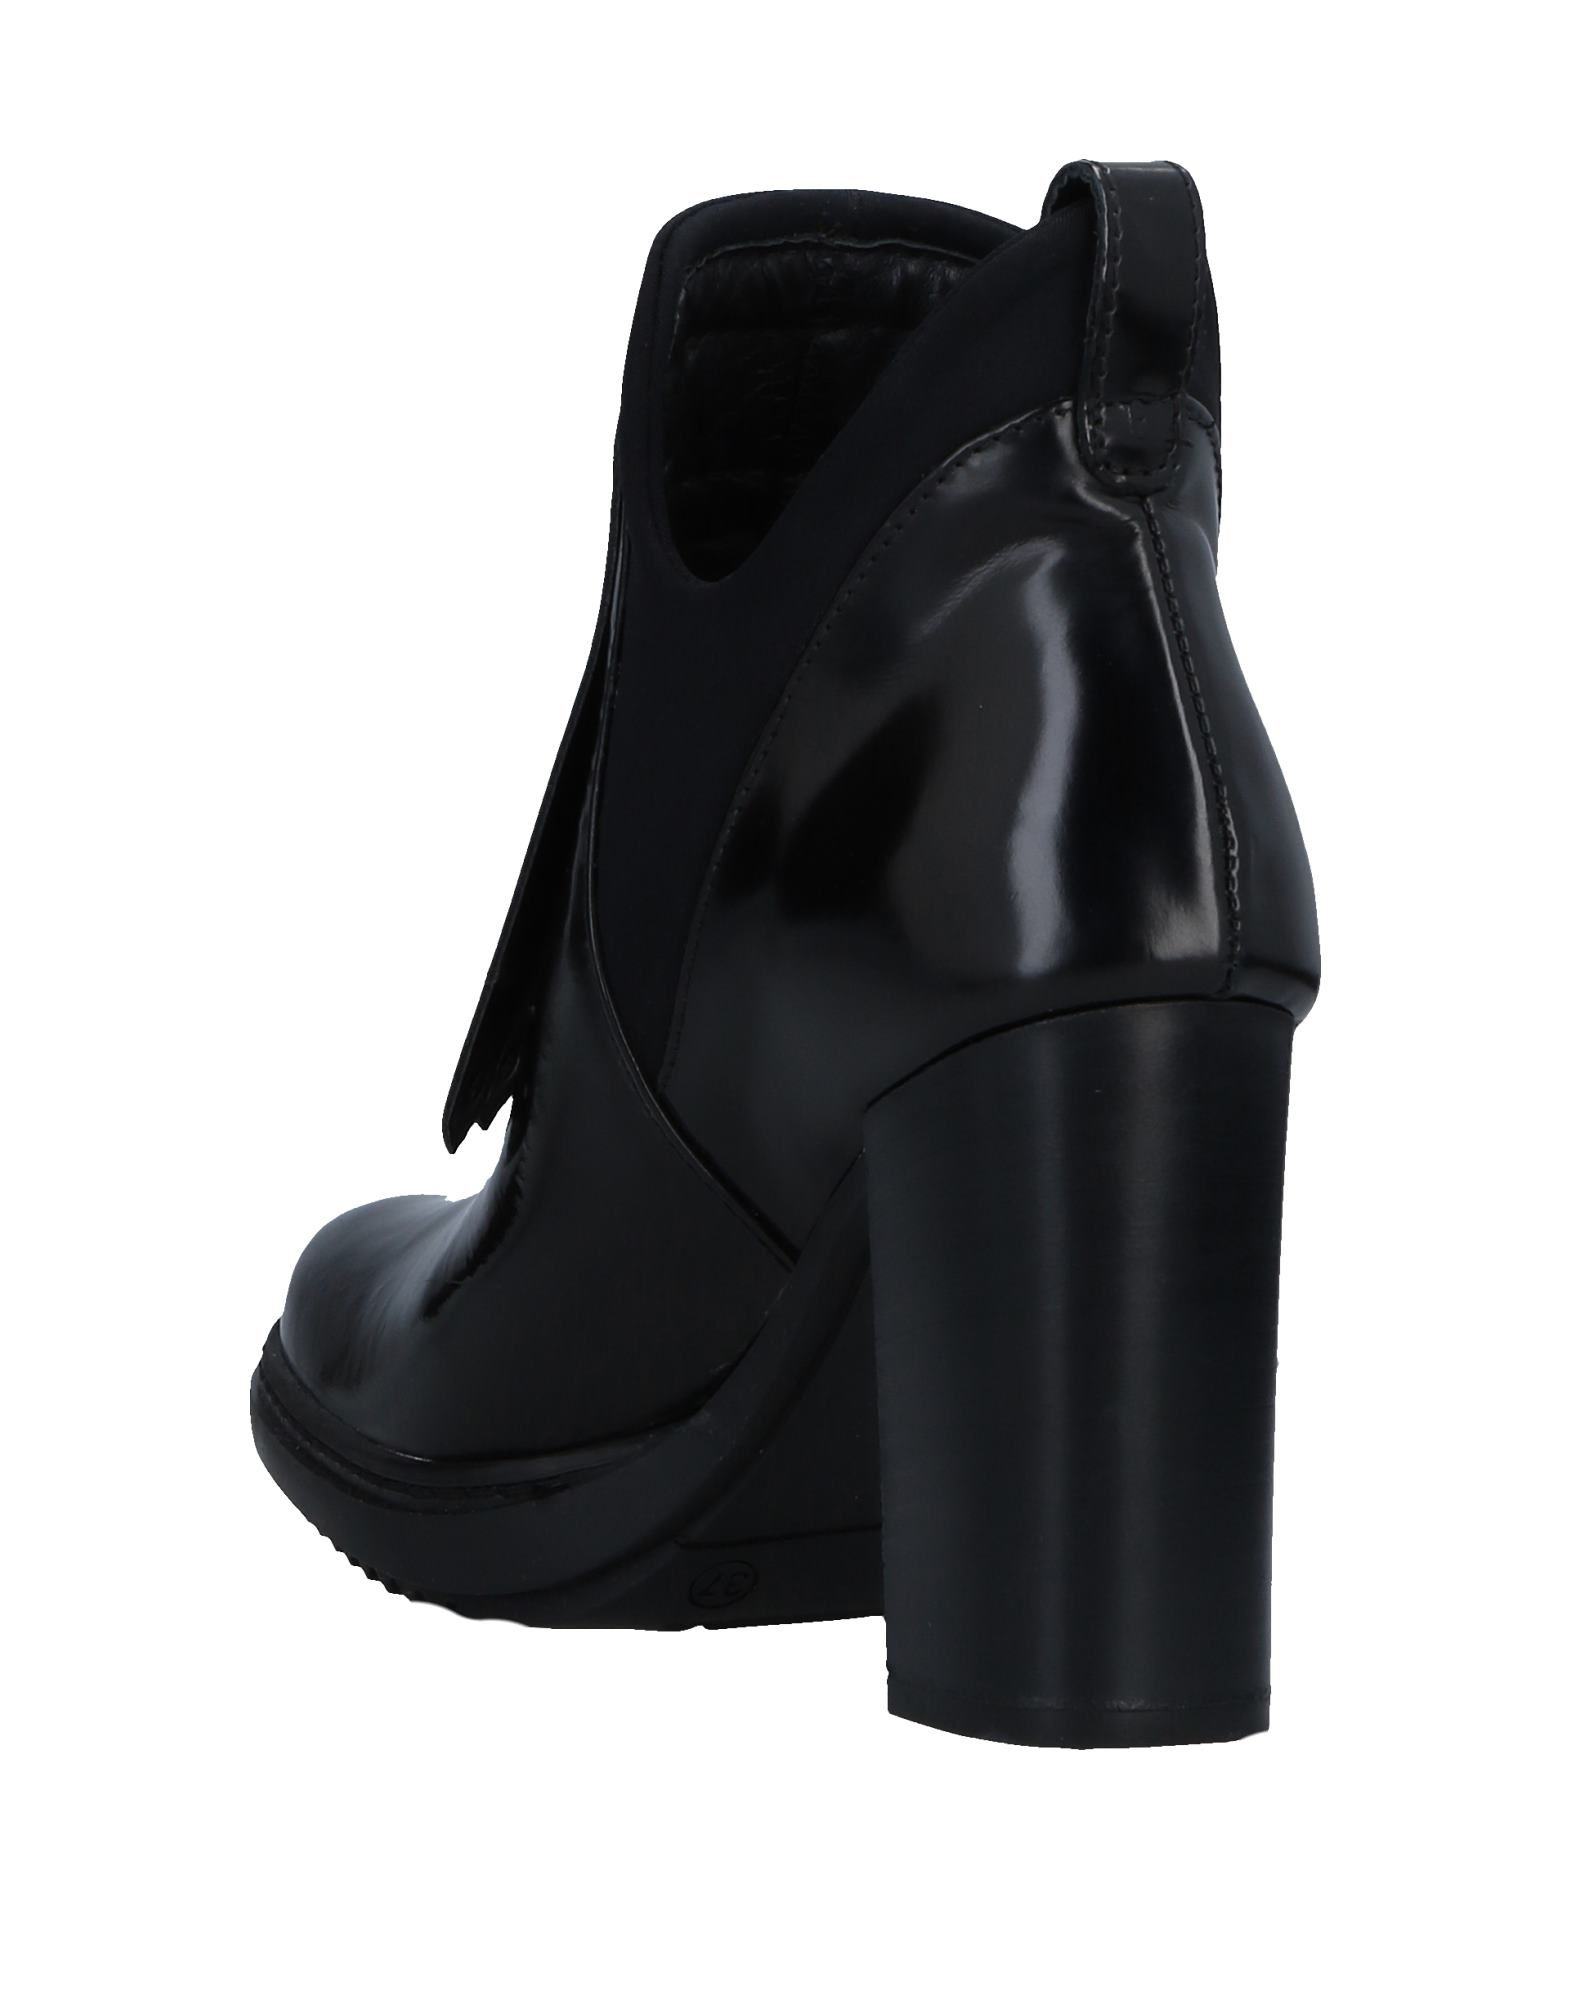 Peperosa Stiefelette Damen  beliebte 11516756NP Gute Qualität beliebte  Schuhe 8fc1c2